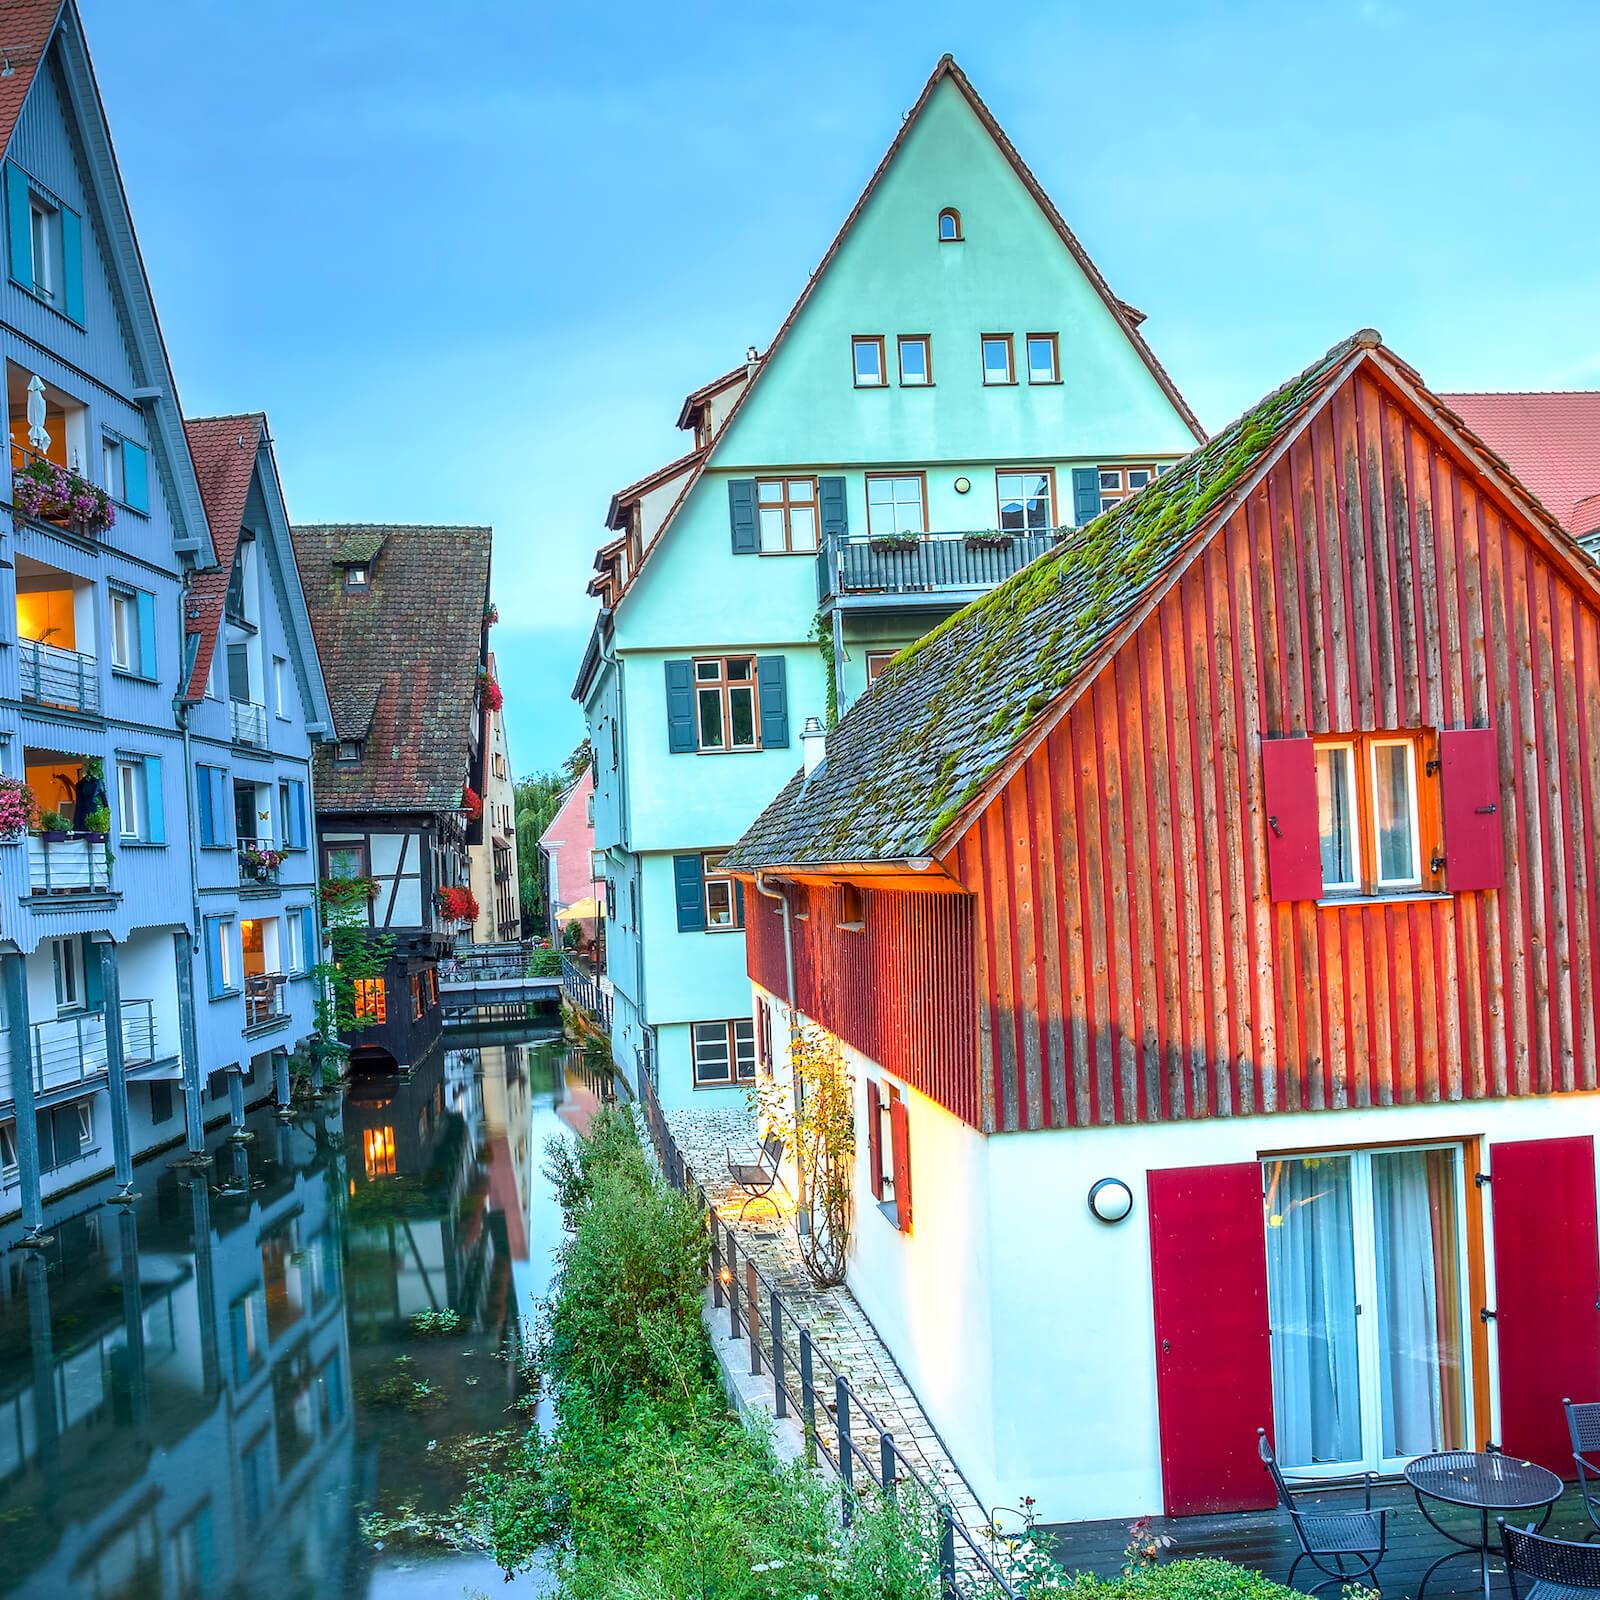 Ulm: Kinderbetreuung im Privathaushalt Nanny gesucht